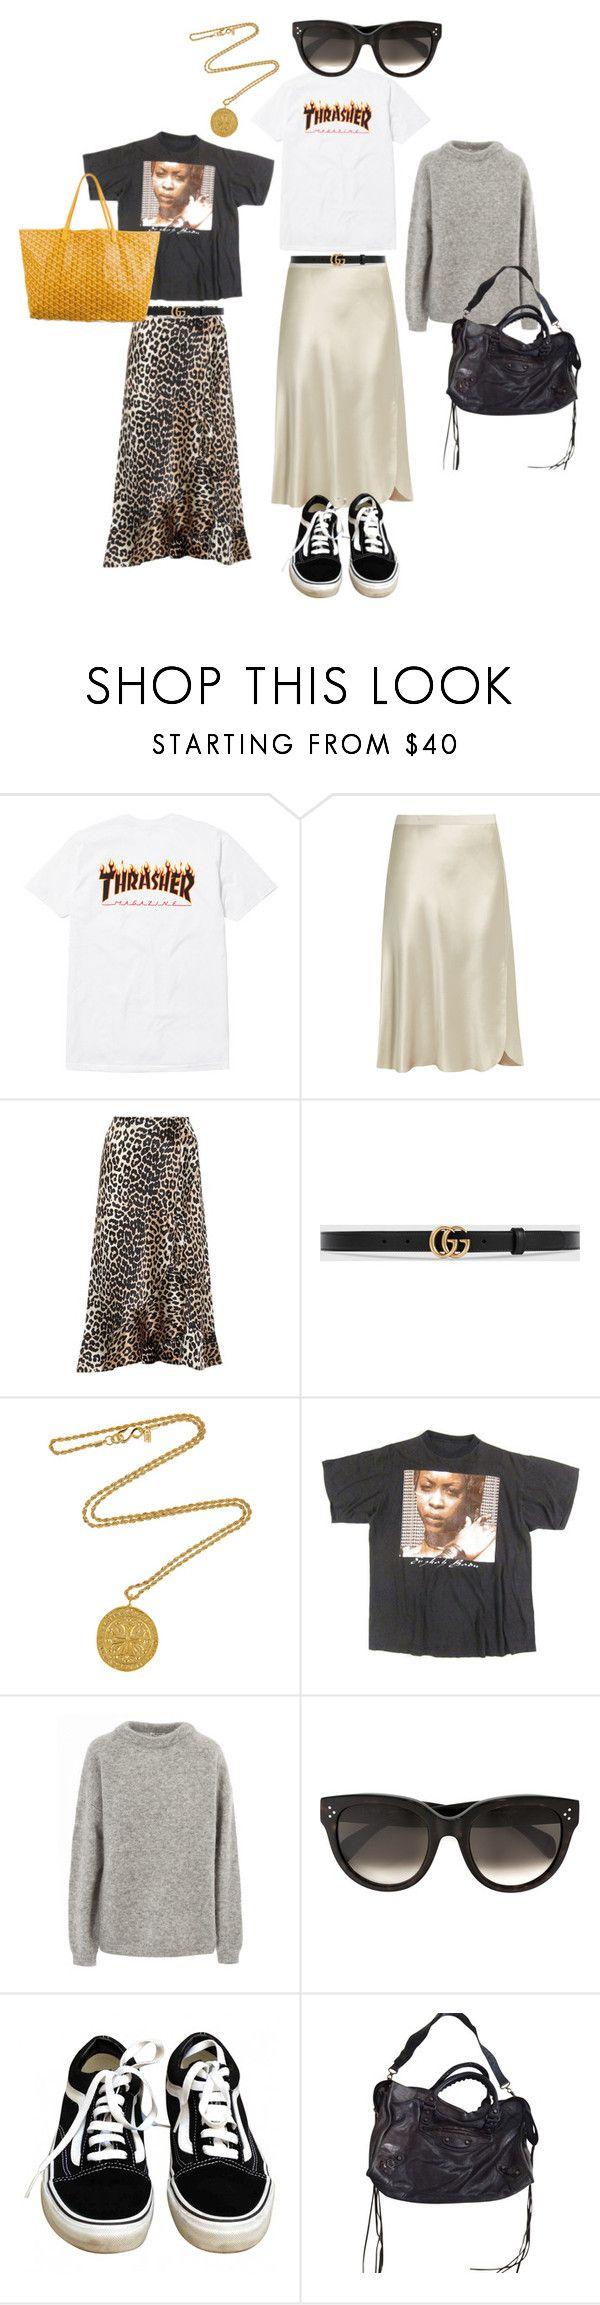 """August in Paris"" by fashiondisguise on Polyvore featuring Nili Lotan, Ganni, Gucci, Kenneth Jay Lane, Acne Studios, CÉLINE, Vans, Balenciaga and Goyard"